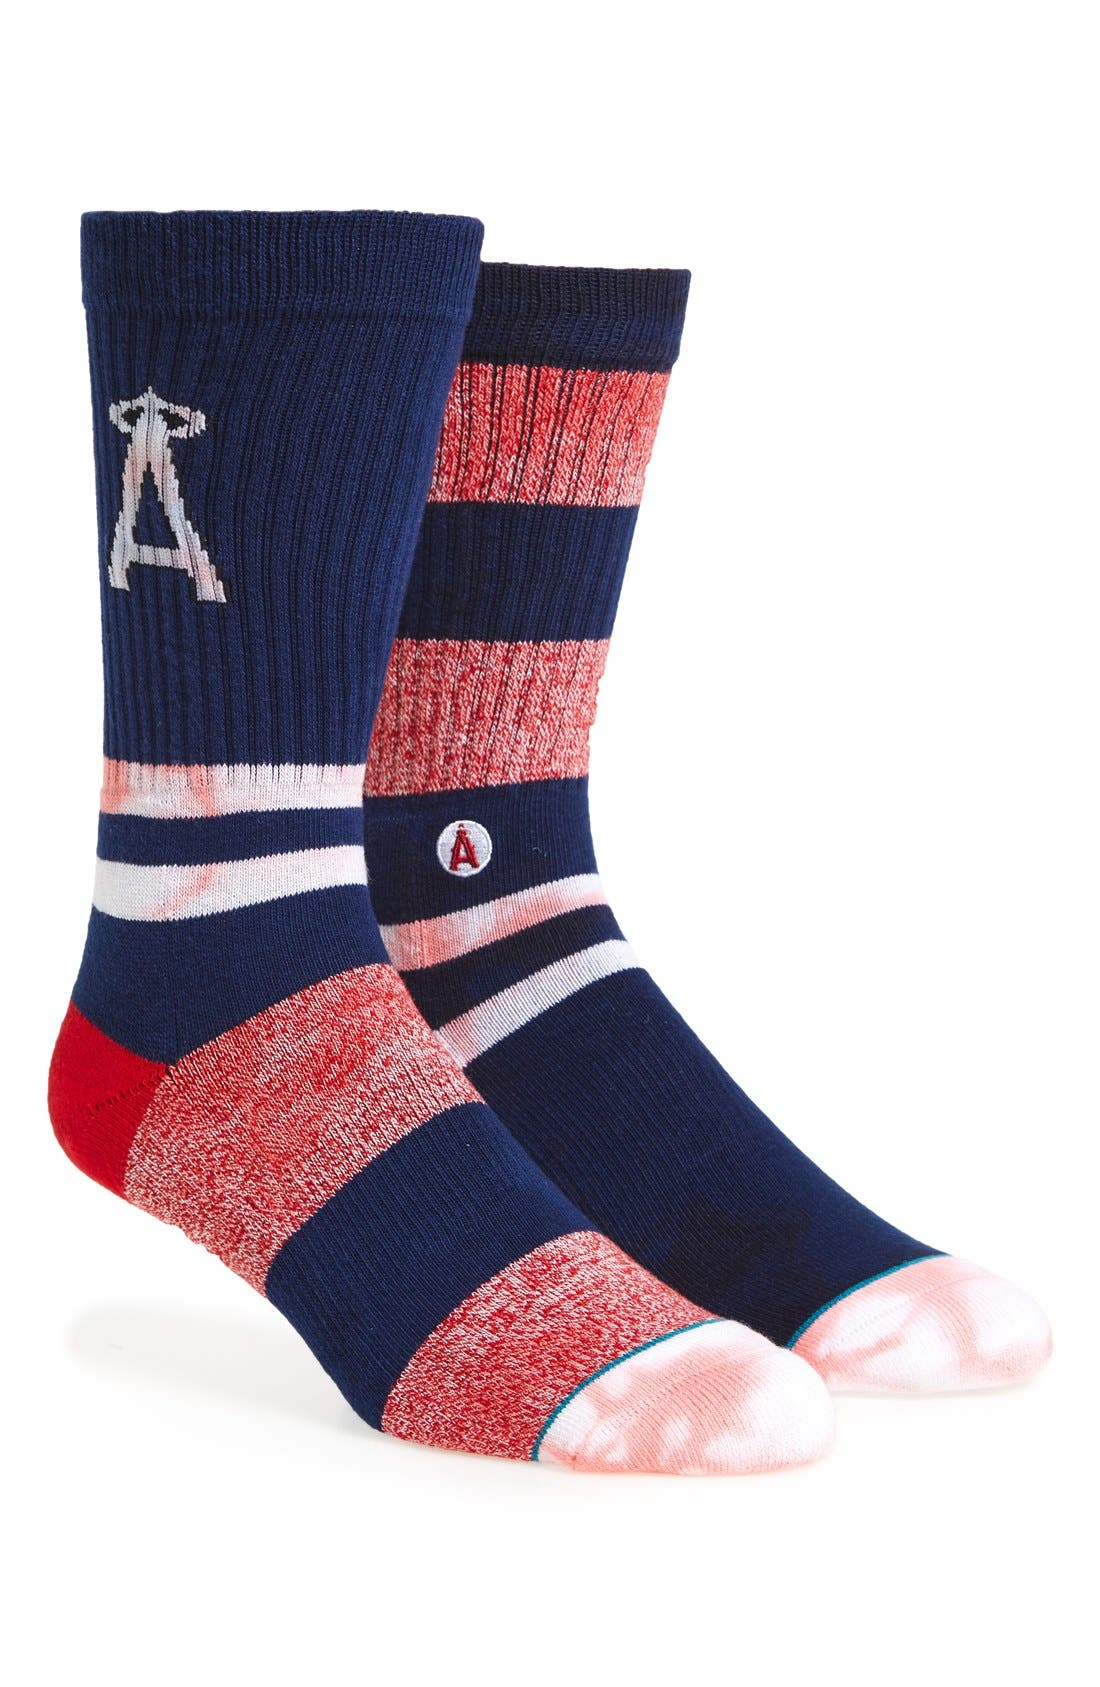 MLB Tye Dye Summer League Angels Crew Socks,                             Main thumbnail 1, color,                             410